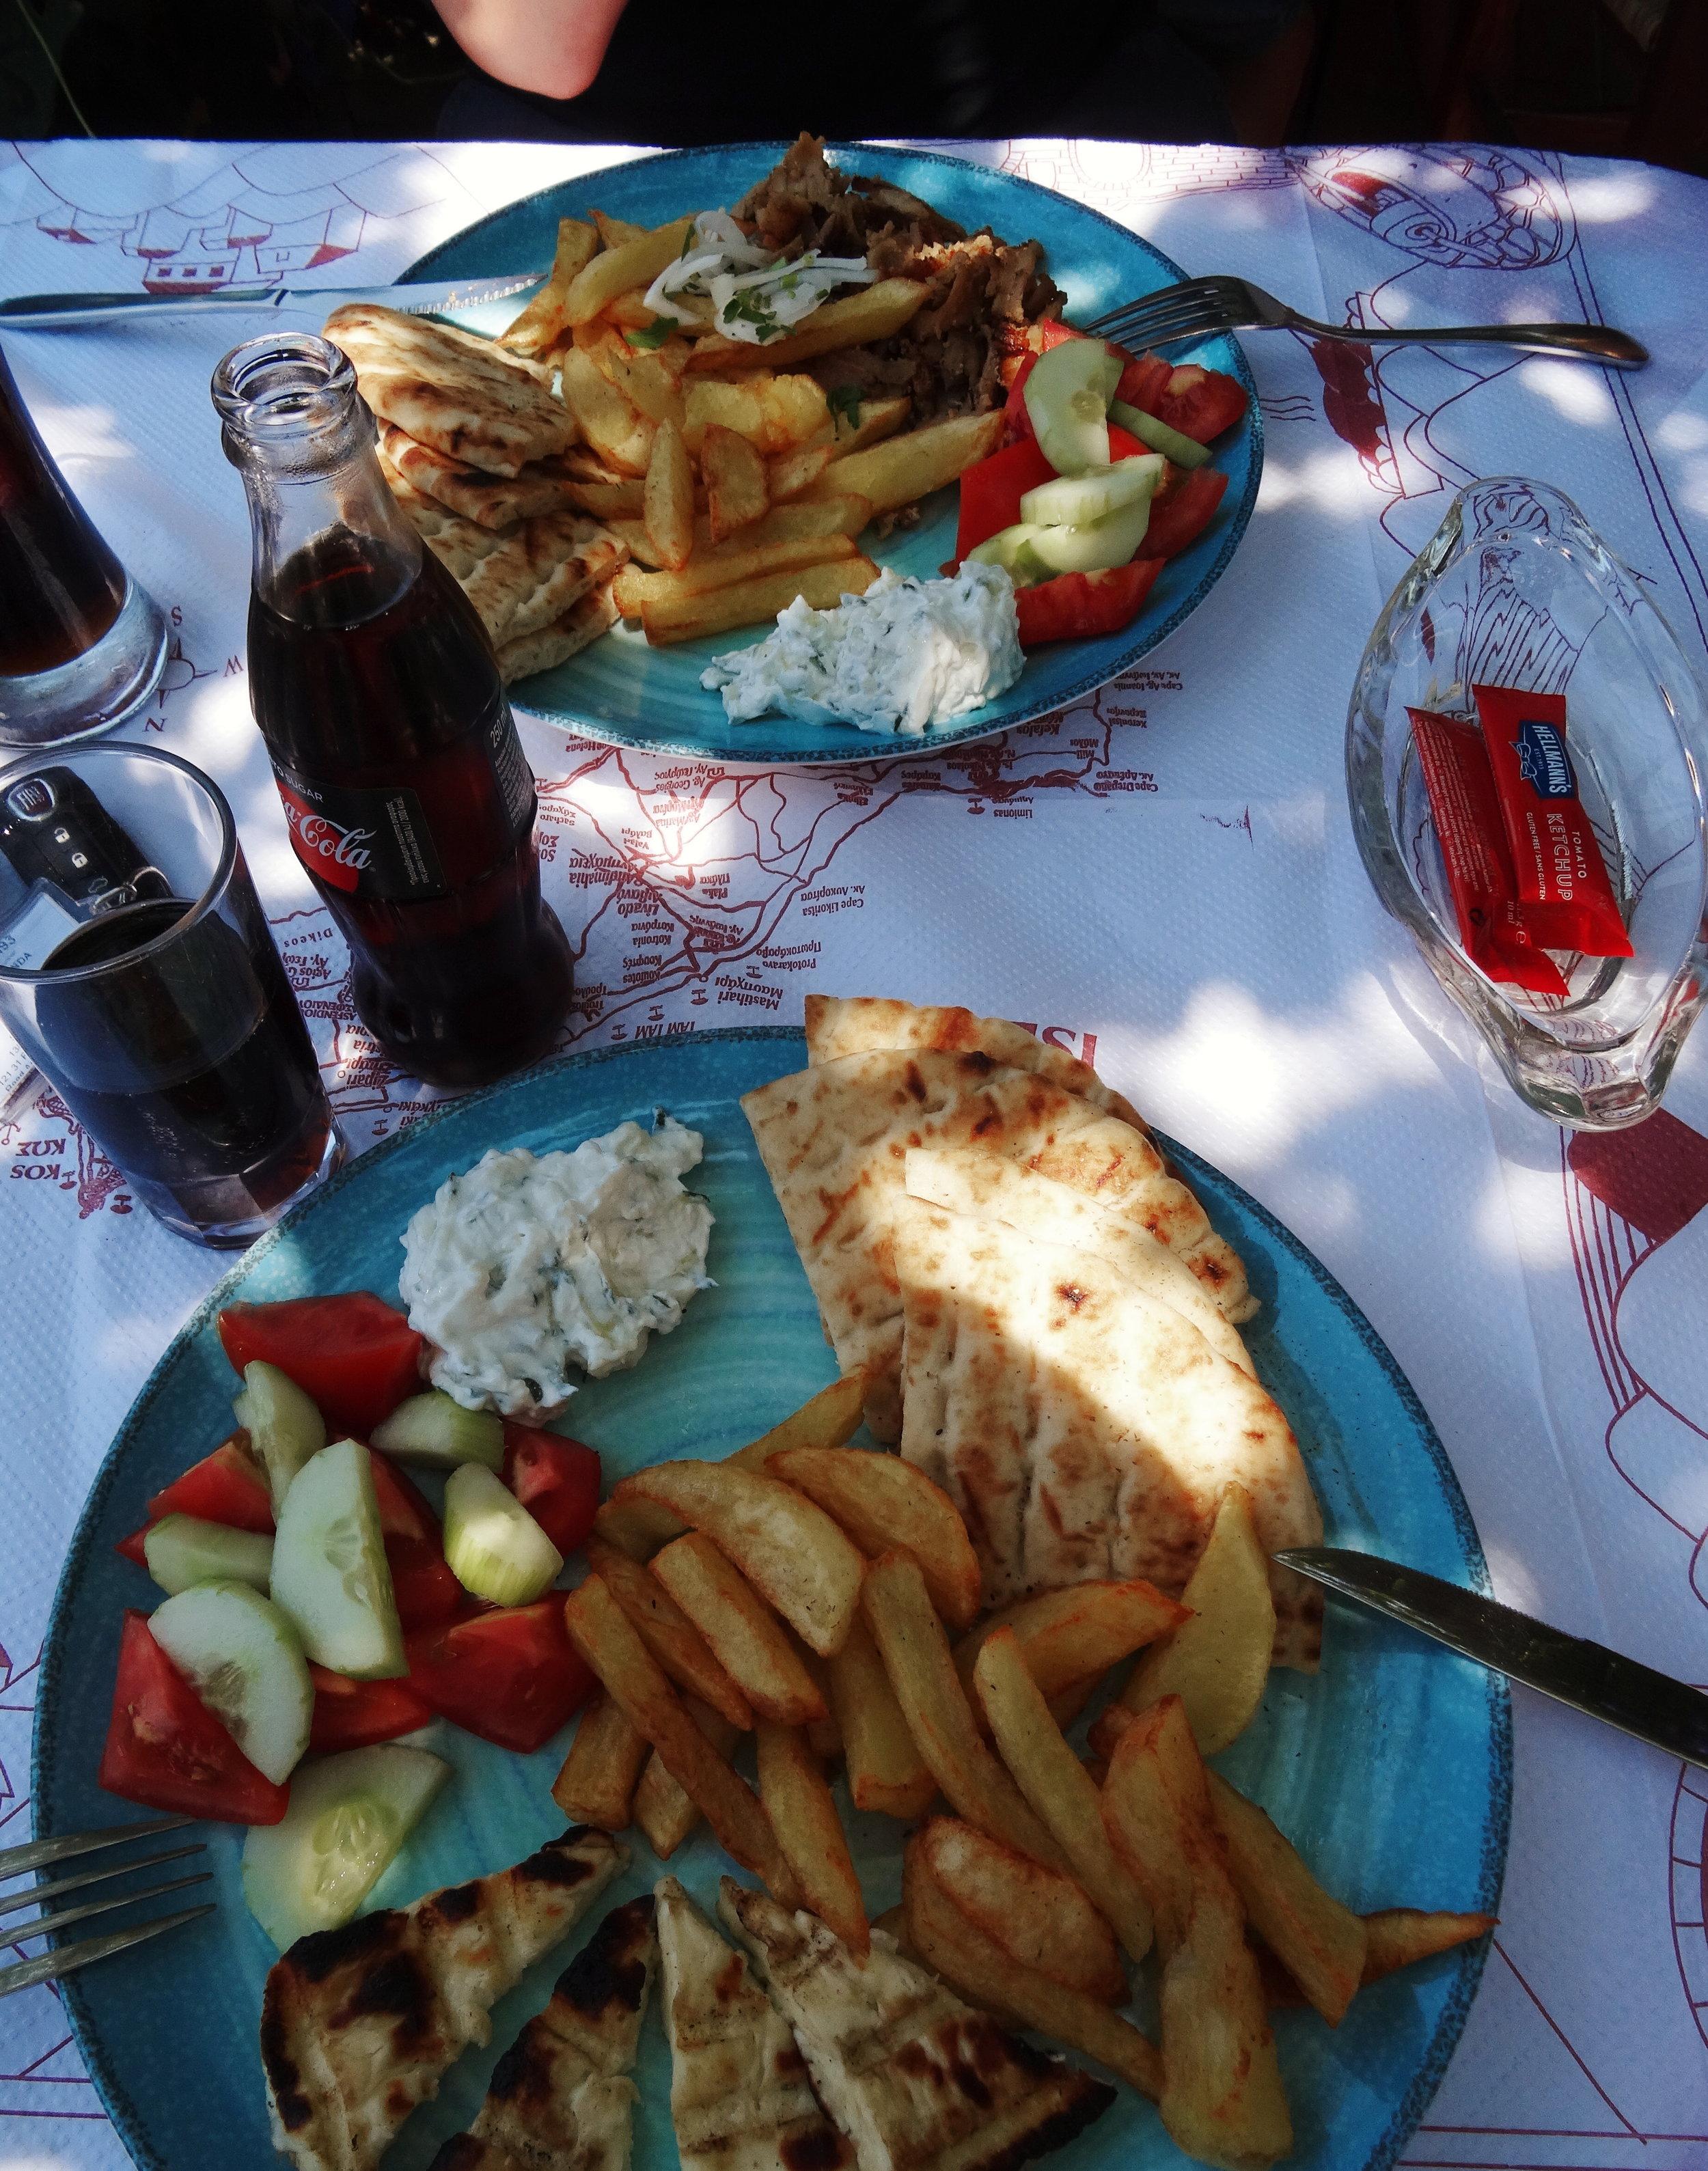 kos-kreikka-ruoka-gyros-mona-kajander-matkablogi